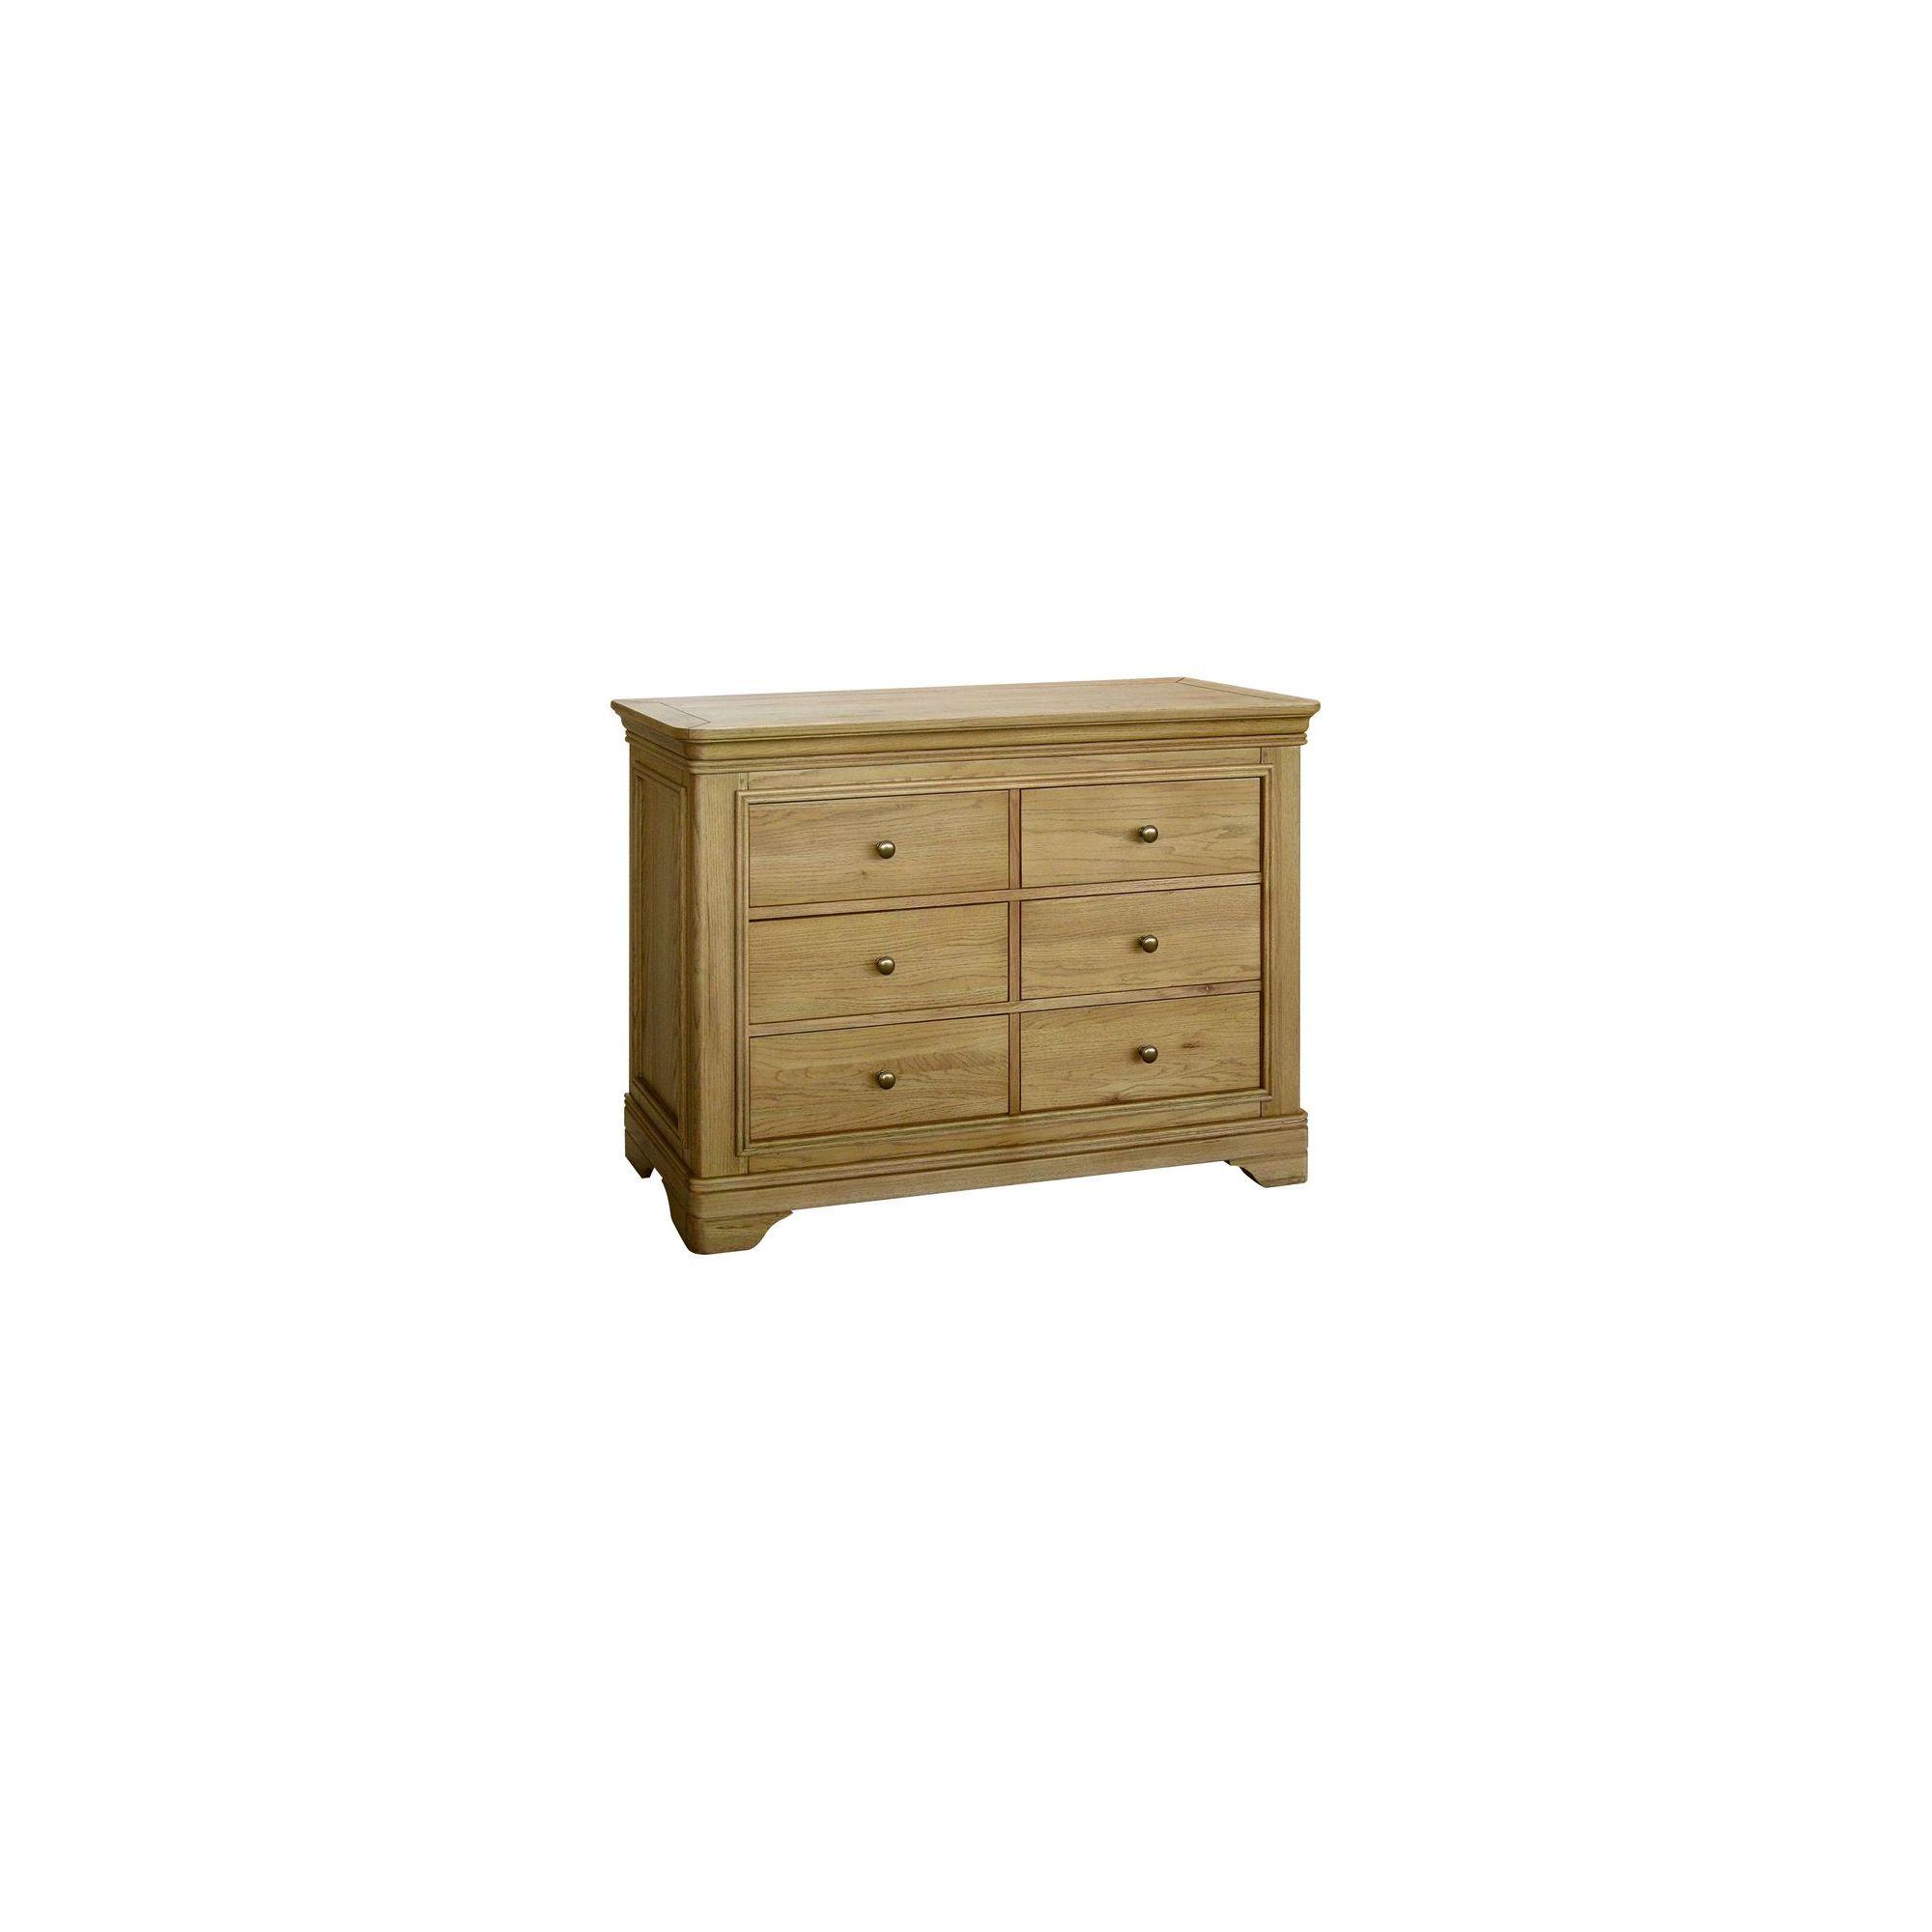 Kelburn Furniture Loire 6 Drawer Chest at Tesco Direct